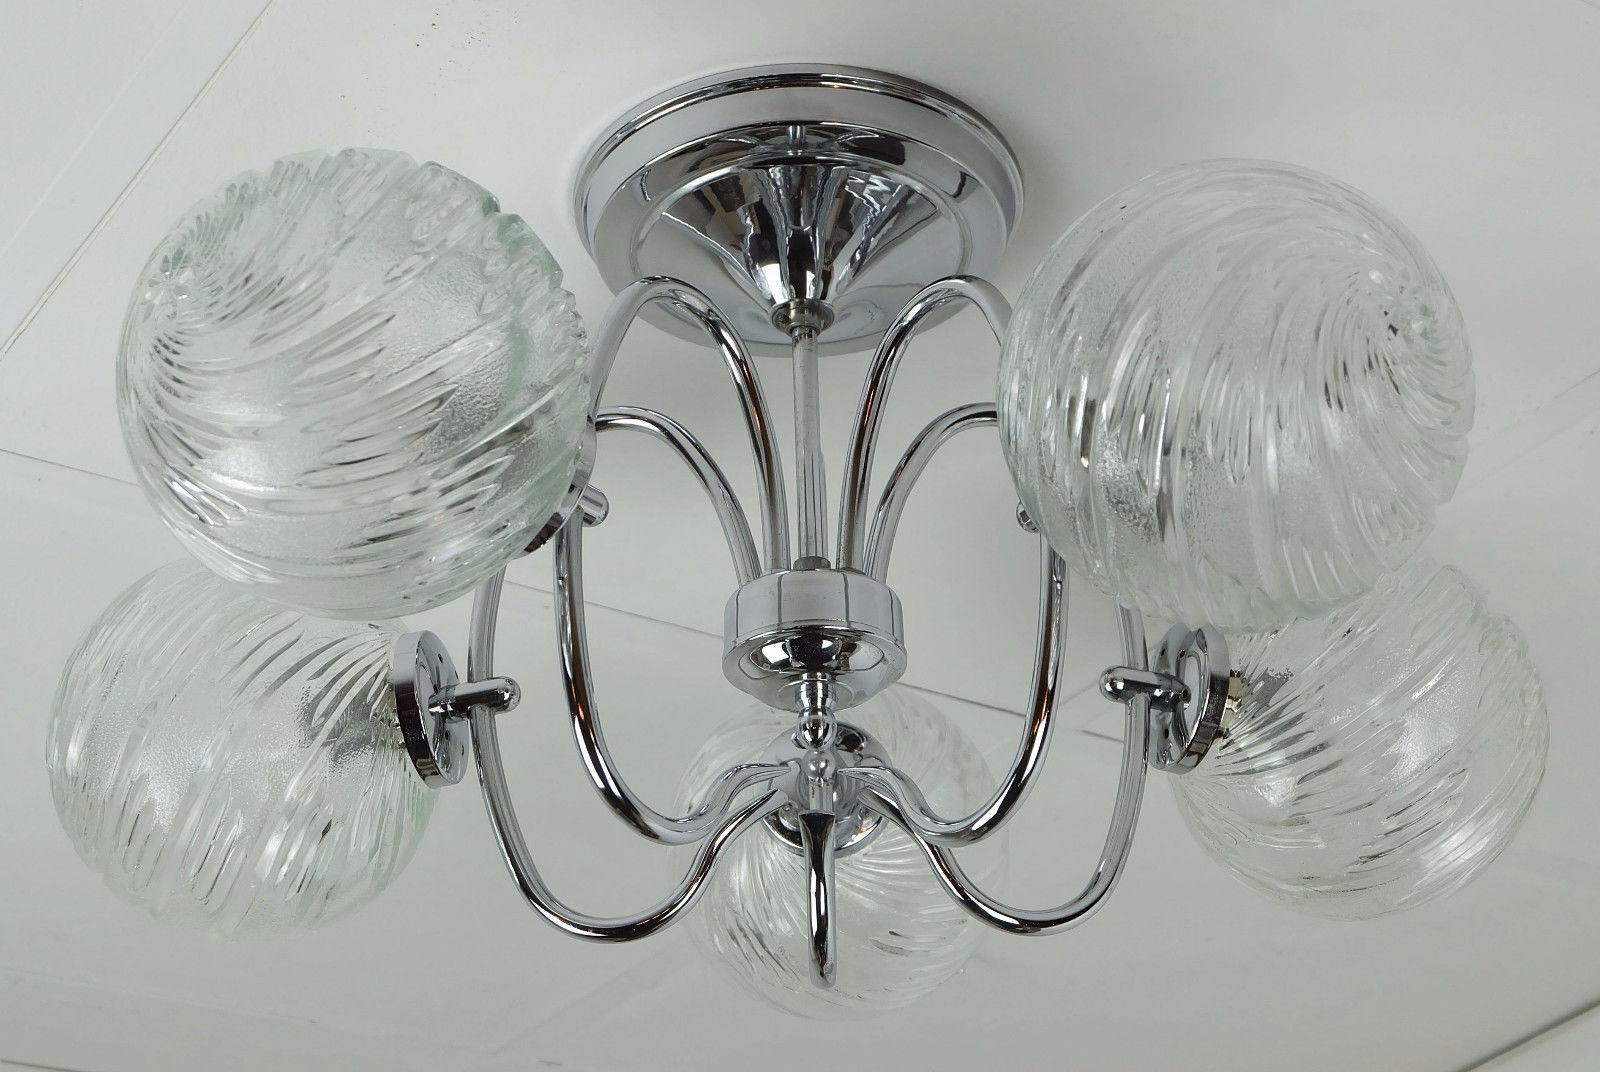 Five Globe Sputnik Orbit Chandelier In Chromed Metal And Glass From Regarding Most Recent Chandelier Globe (View 19 of 20)